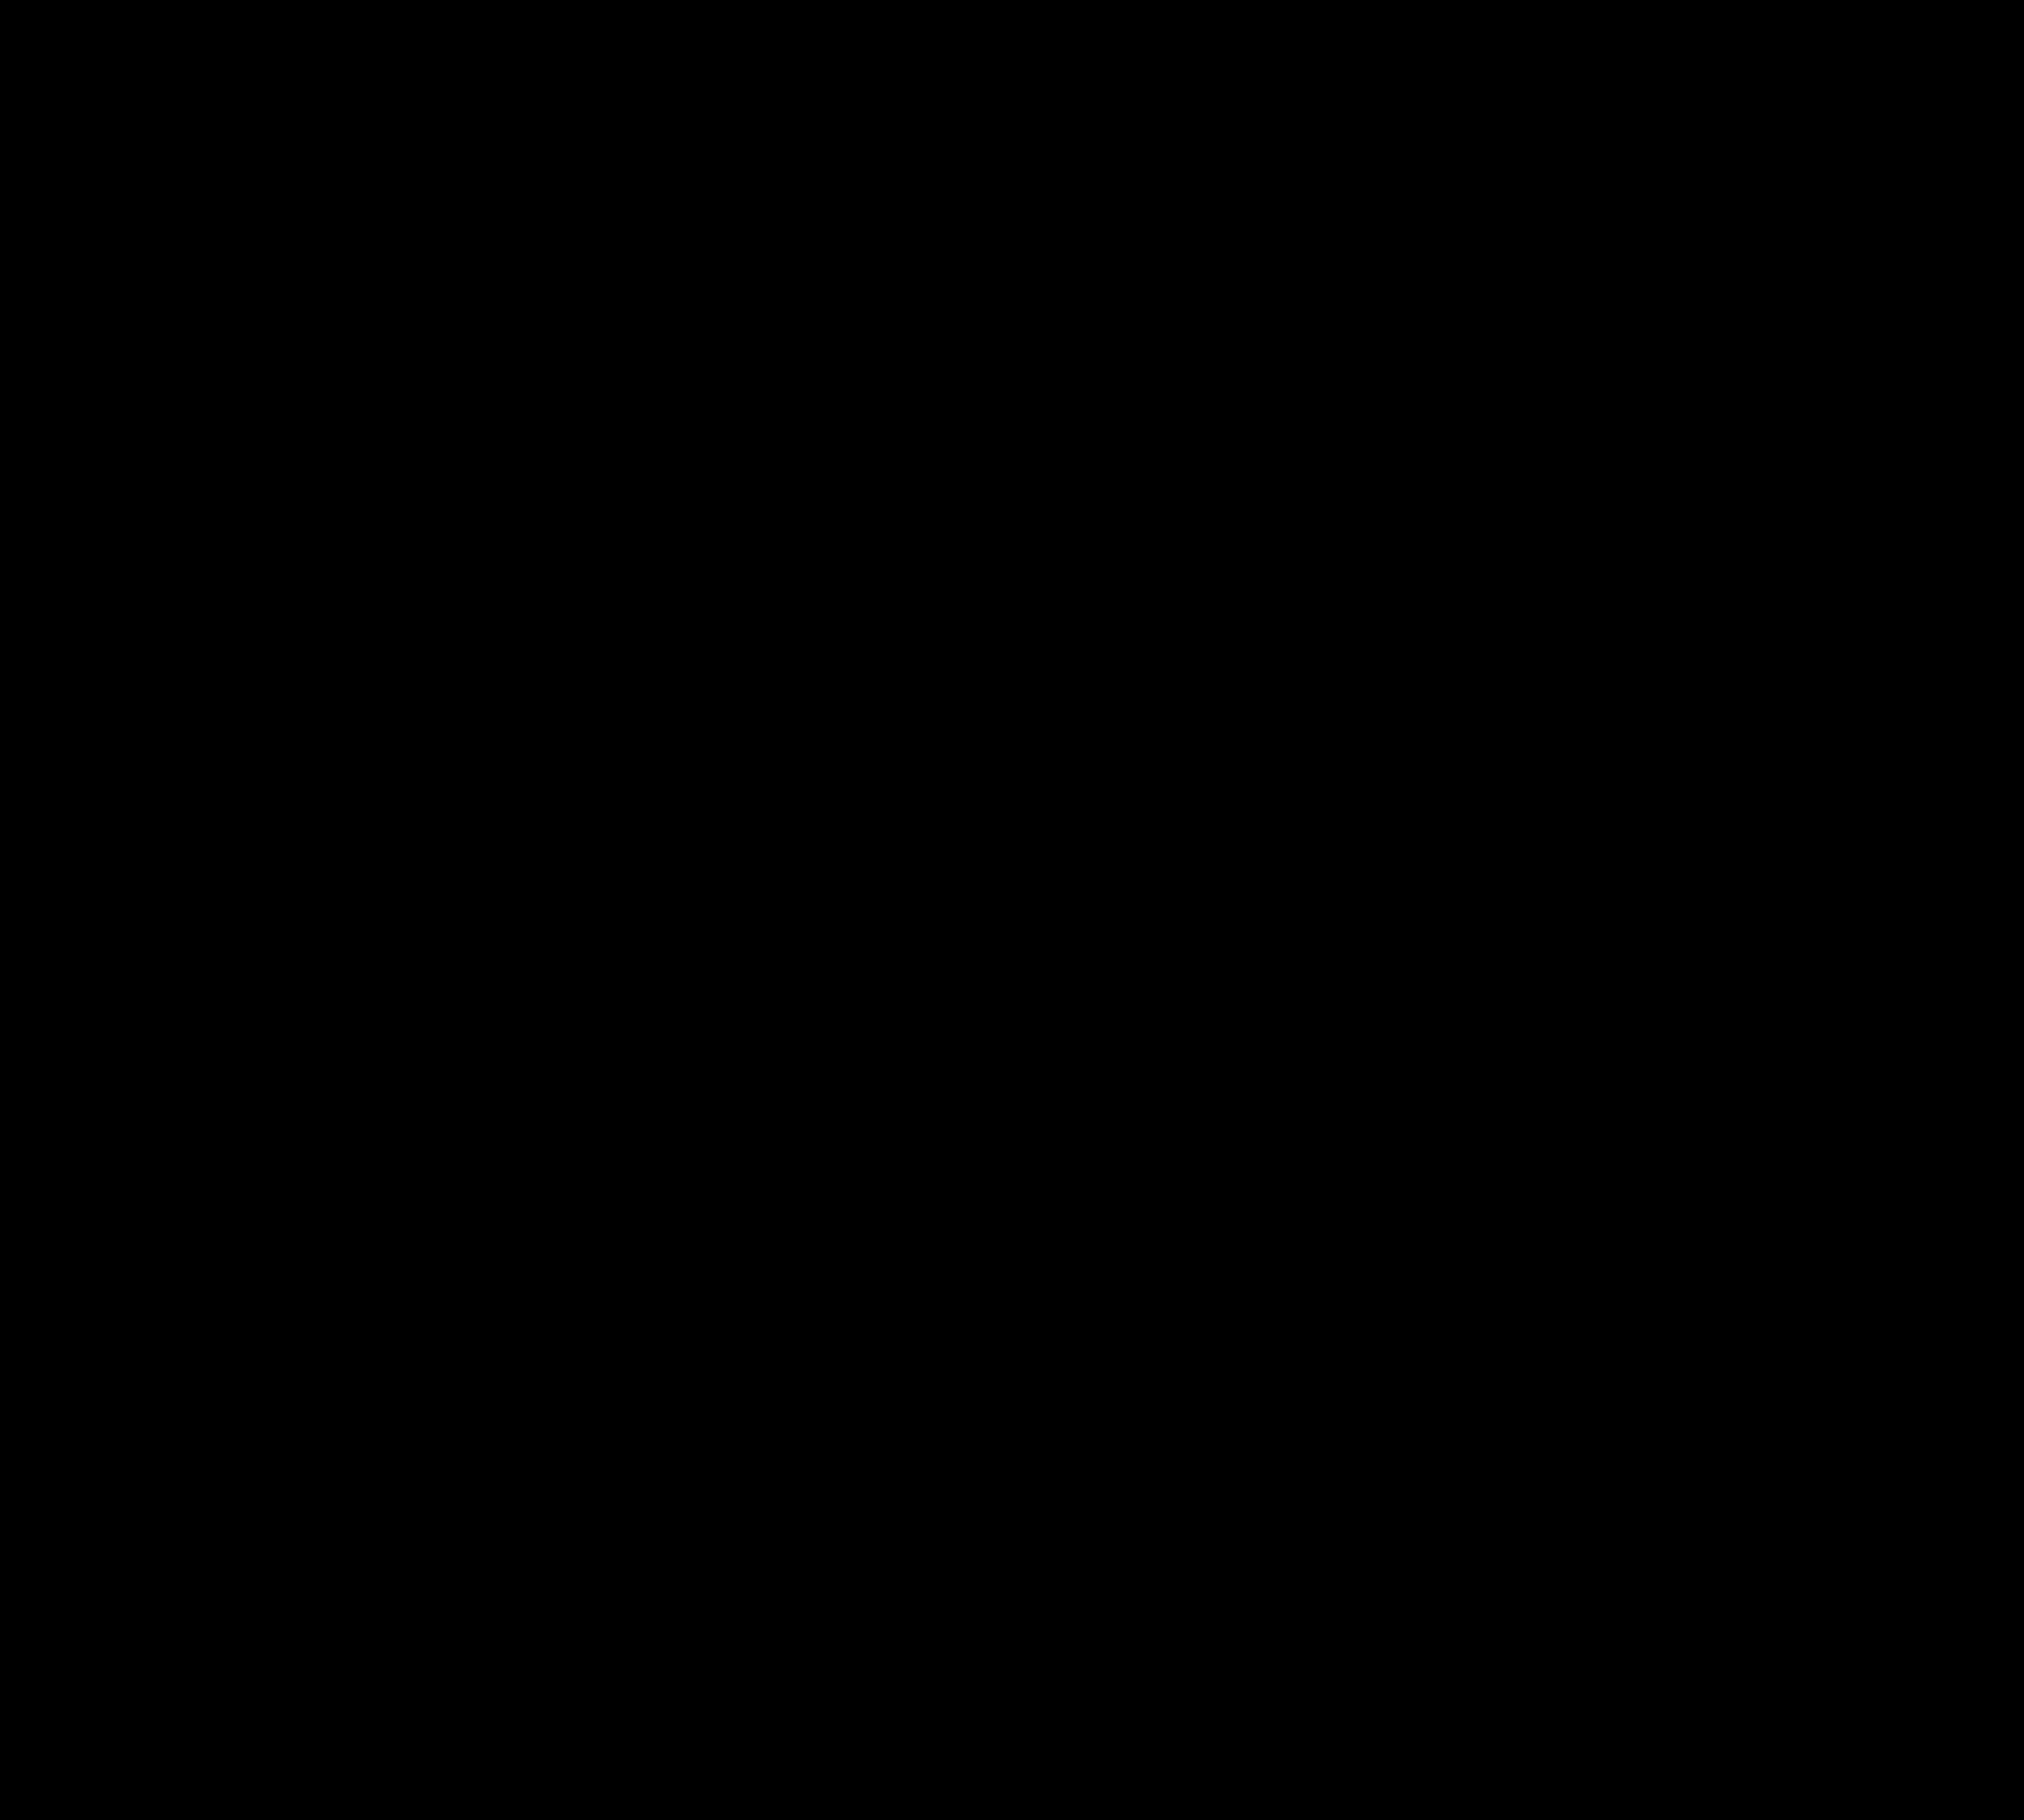 2302x2070 Raven Silhouette Vector Art Image